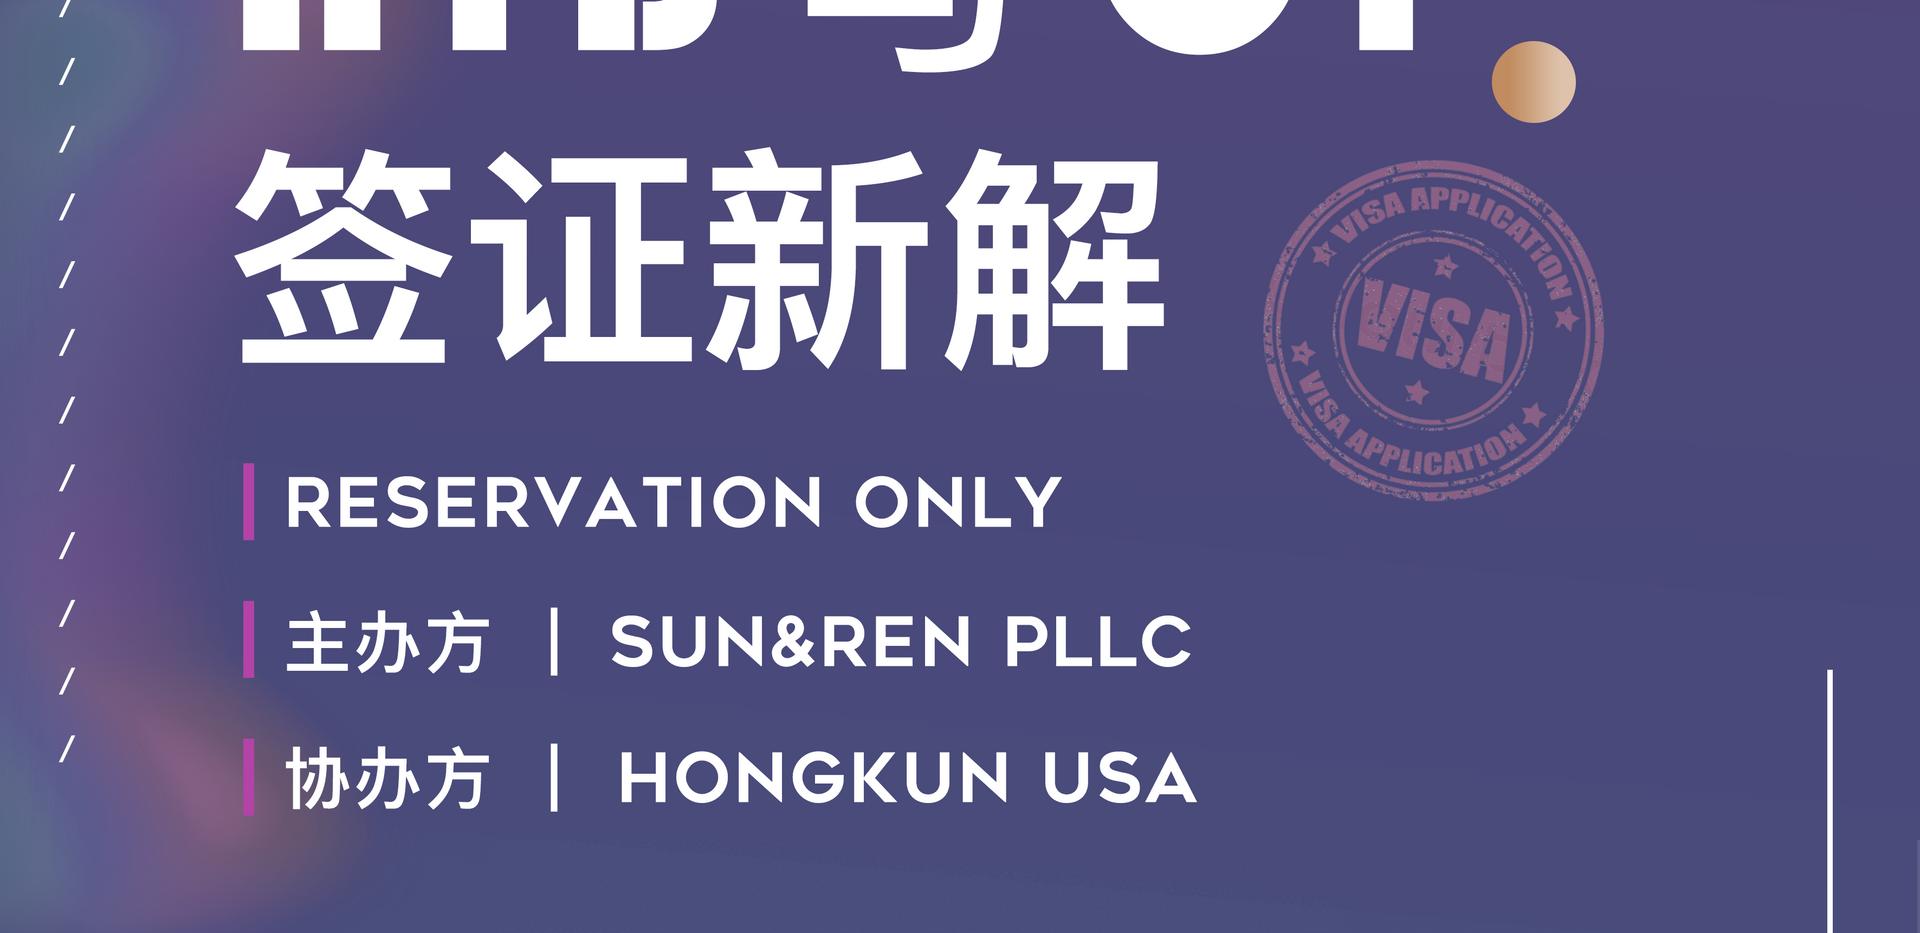 H1B & O1 visa event flyer